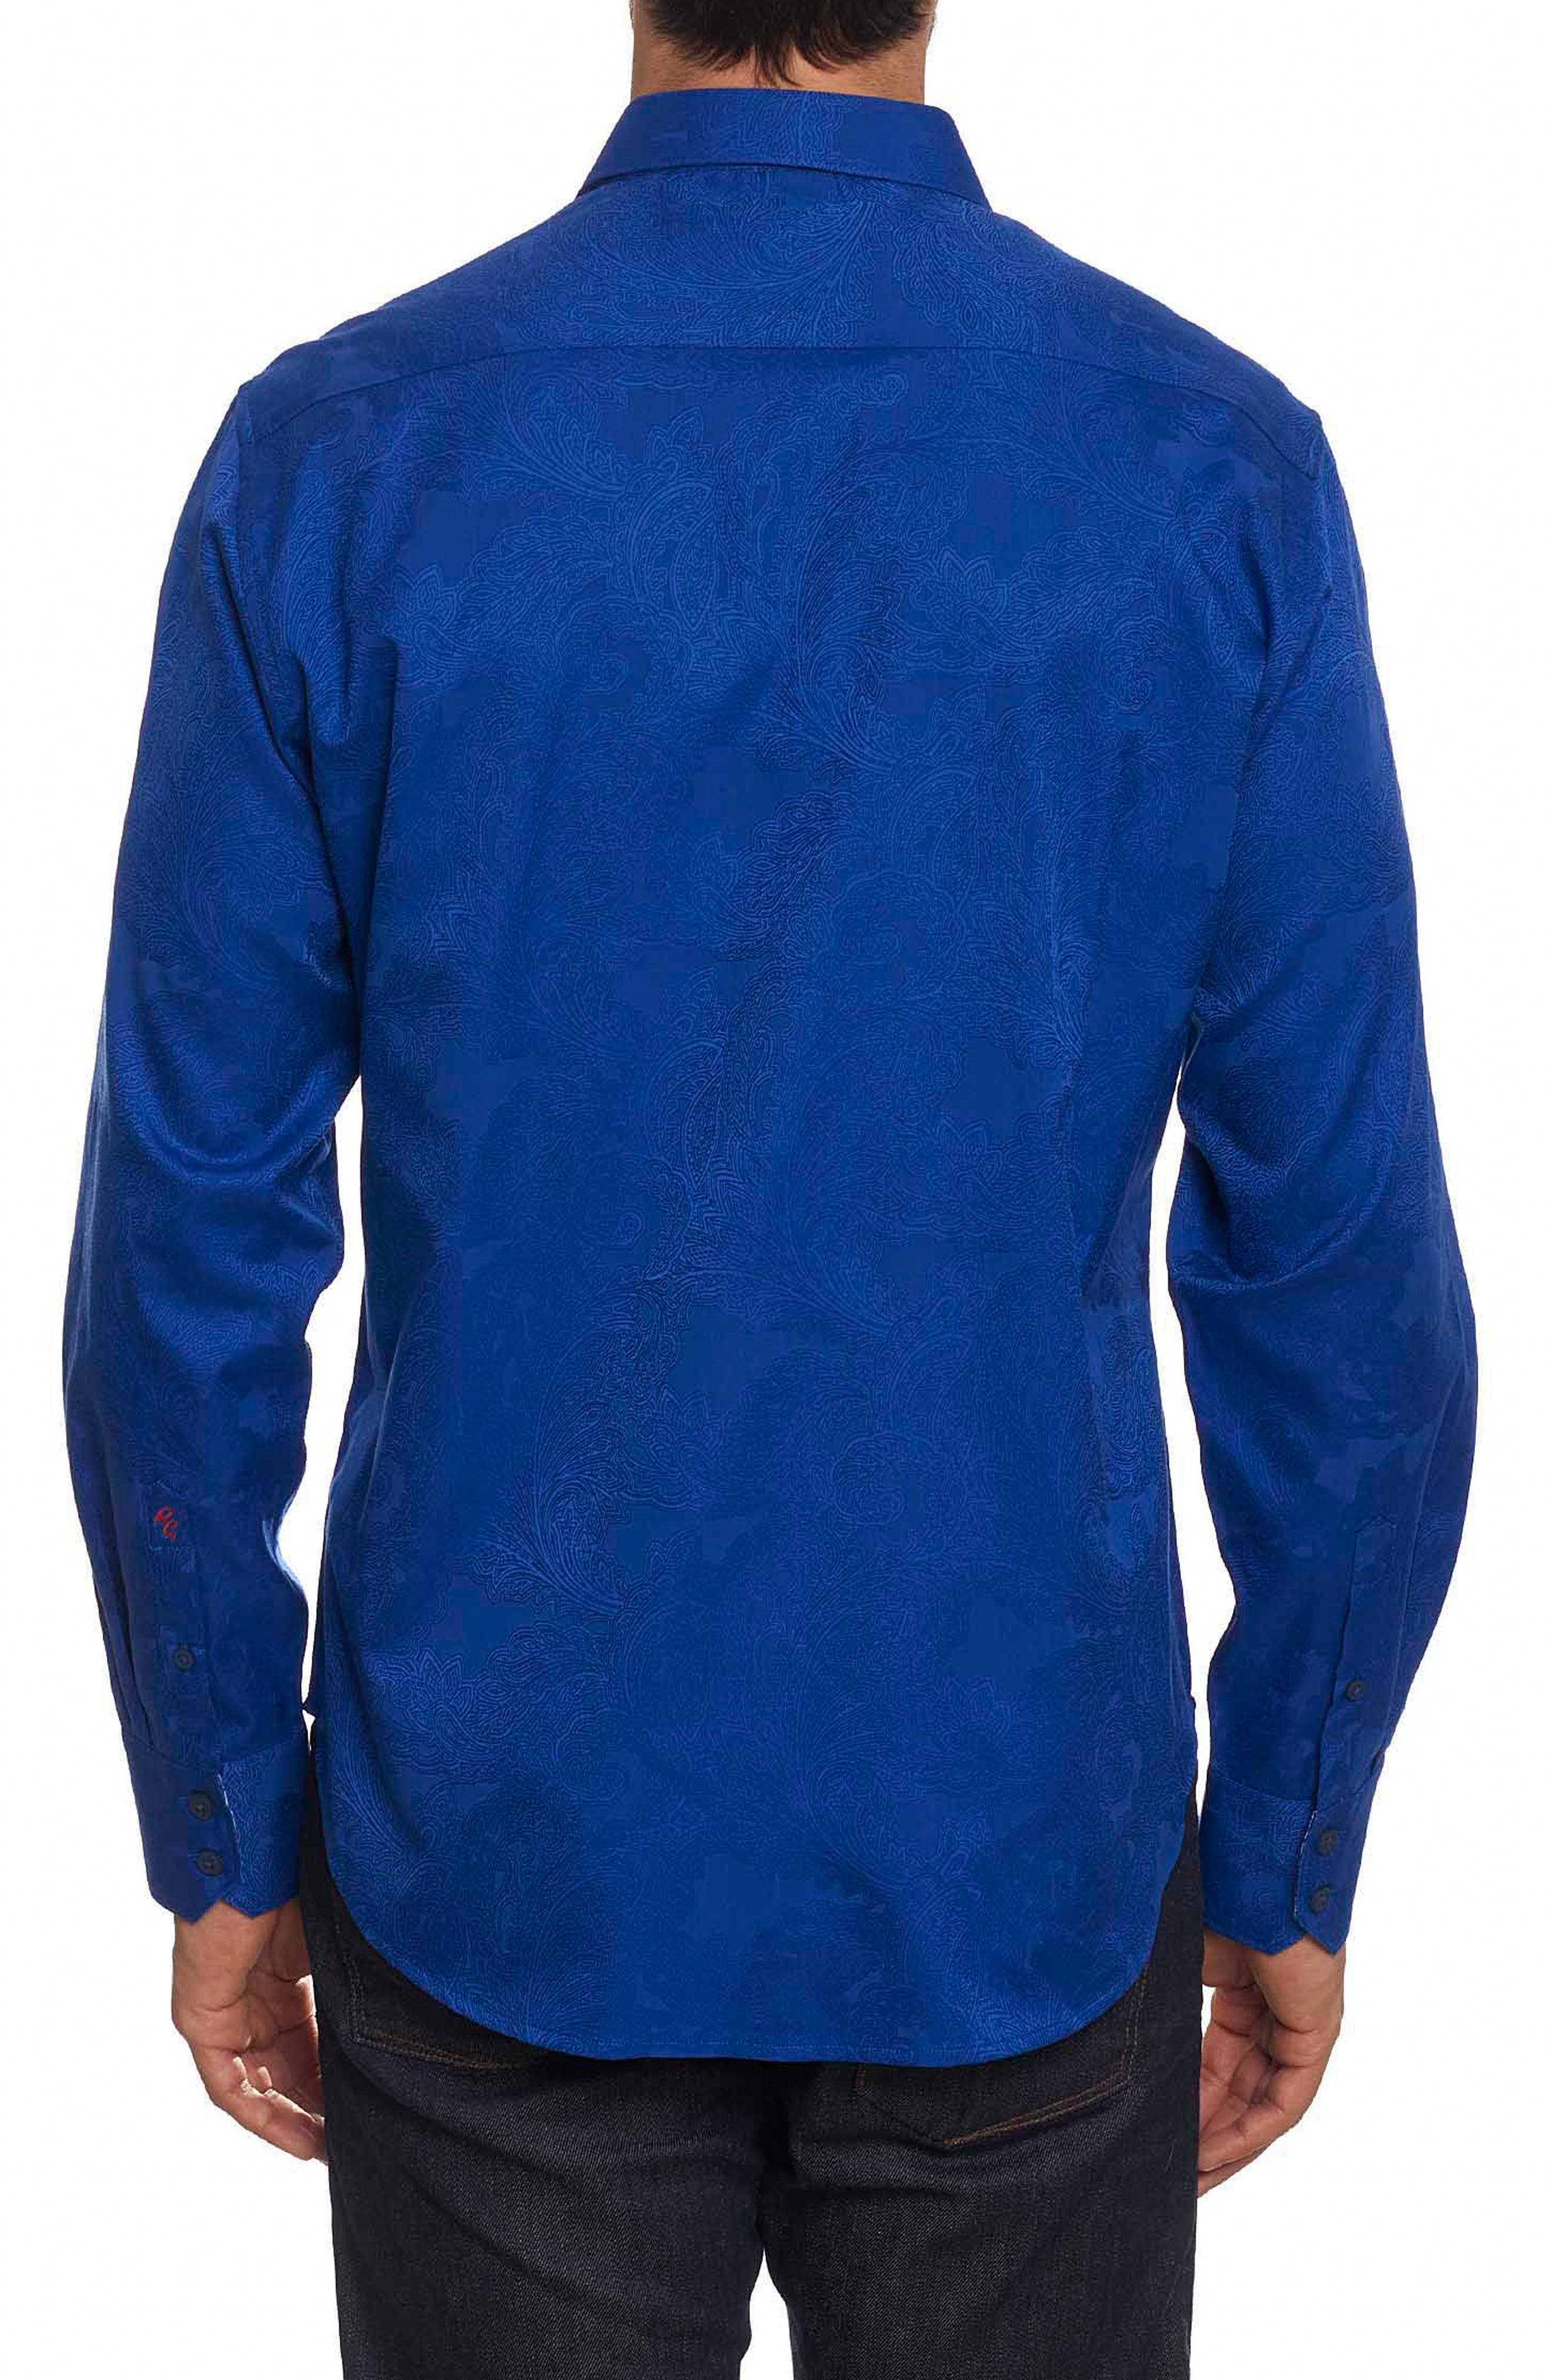 Rosendale Classic Fit Jacquard Sport Shirt,                             Alternate thumbnail 2, color,                             Cobalt